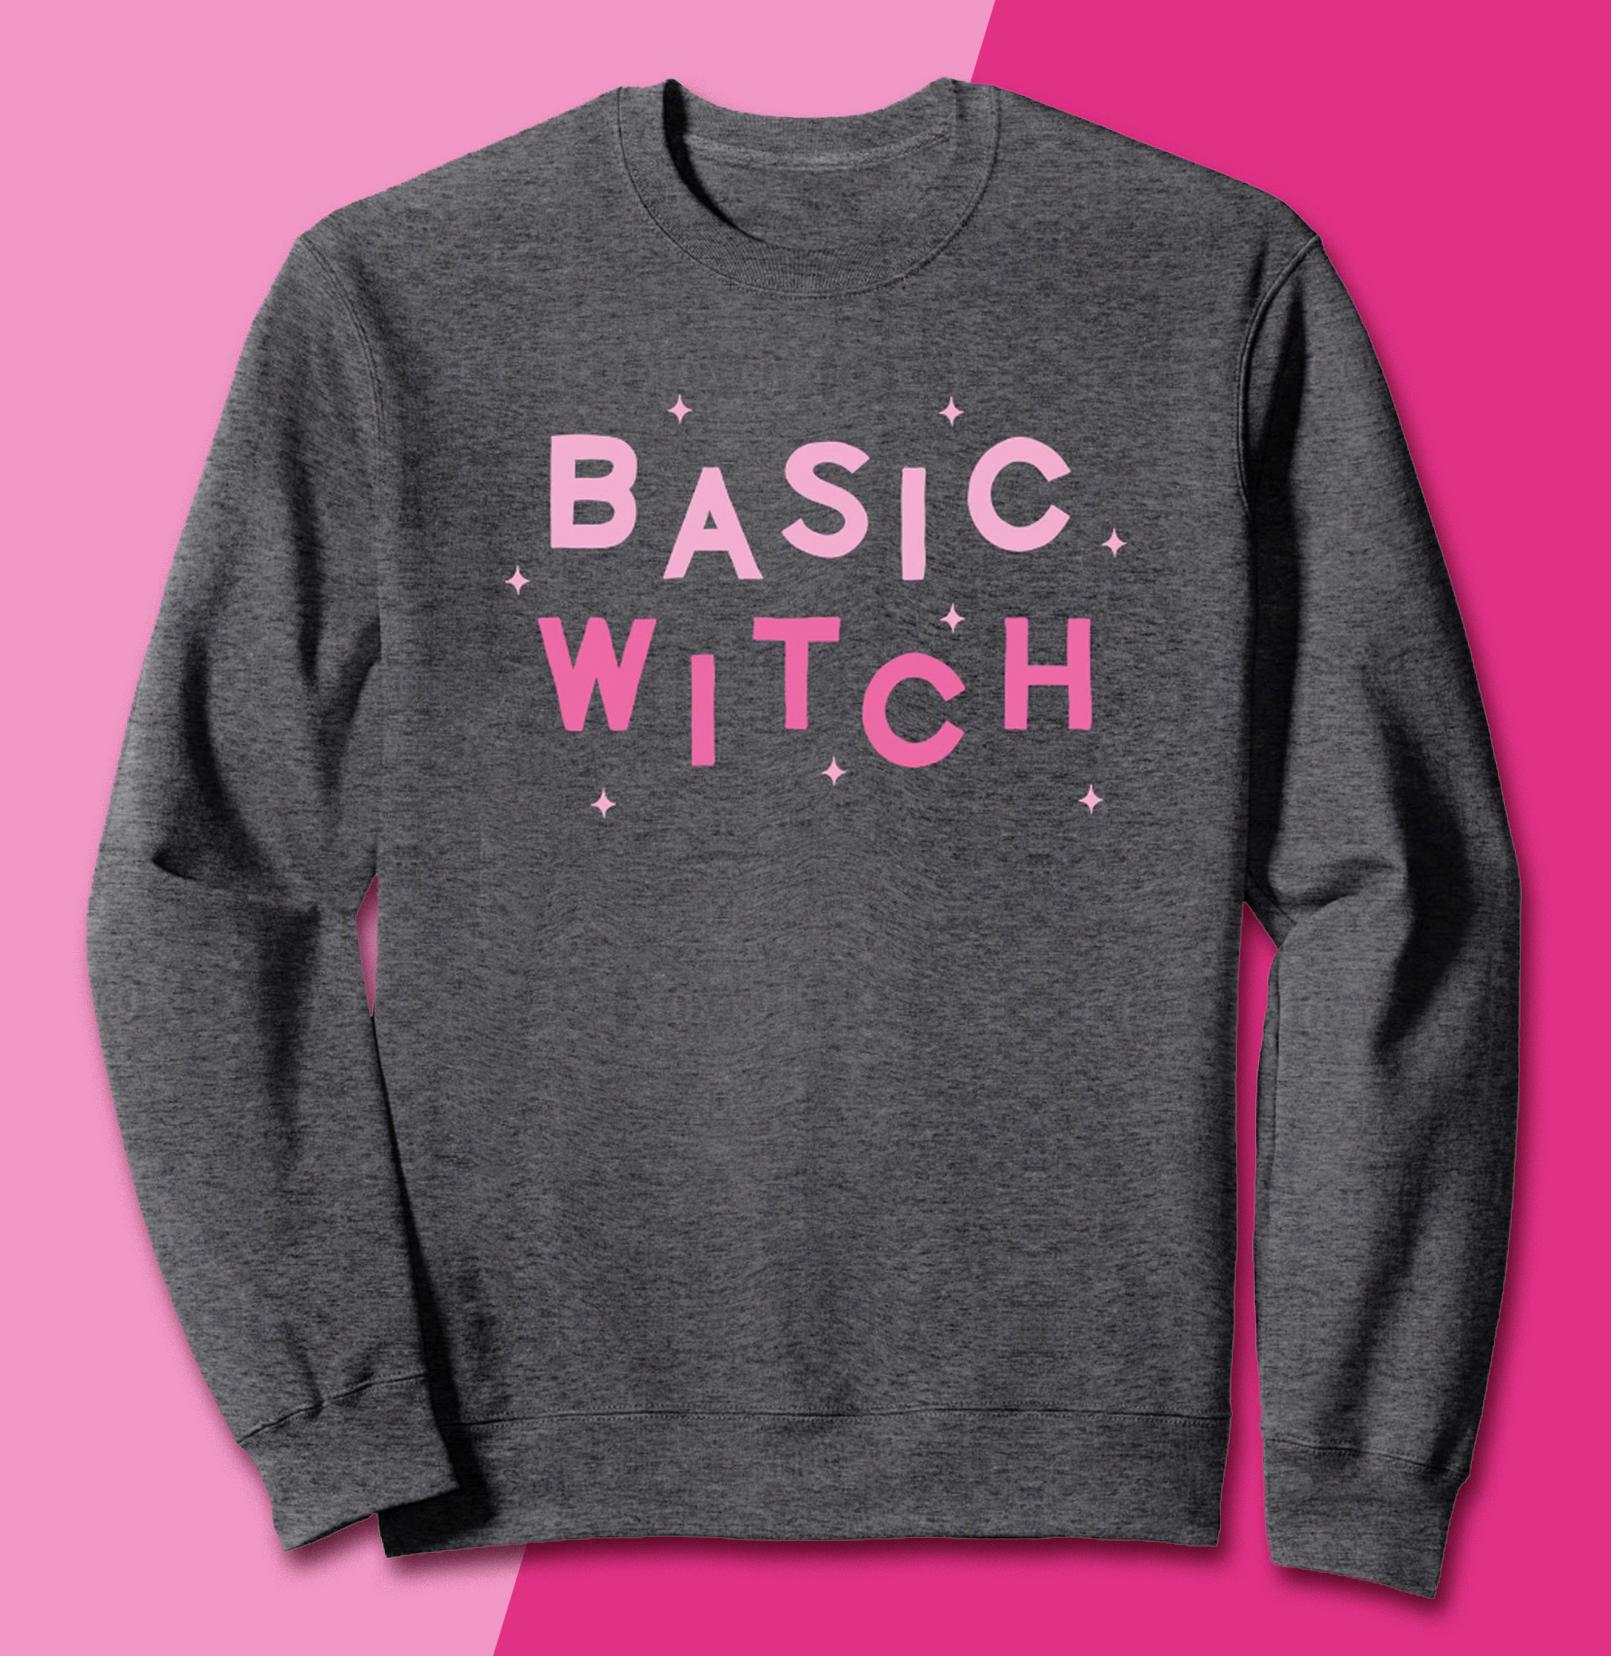 BASIC WITCH CREWNECK  $29.99